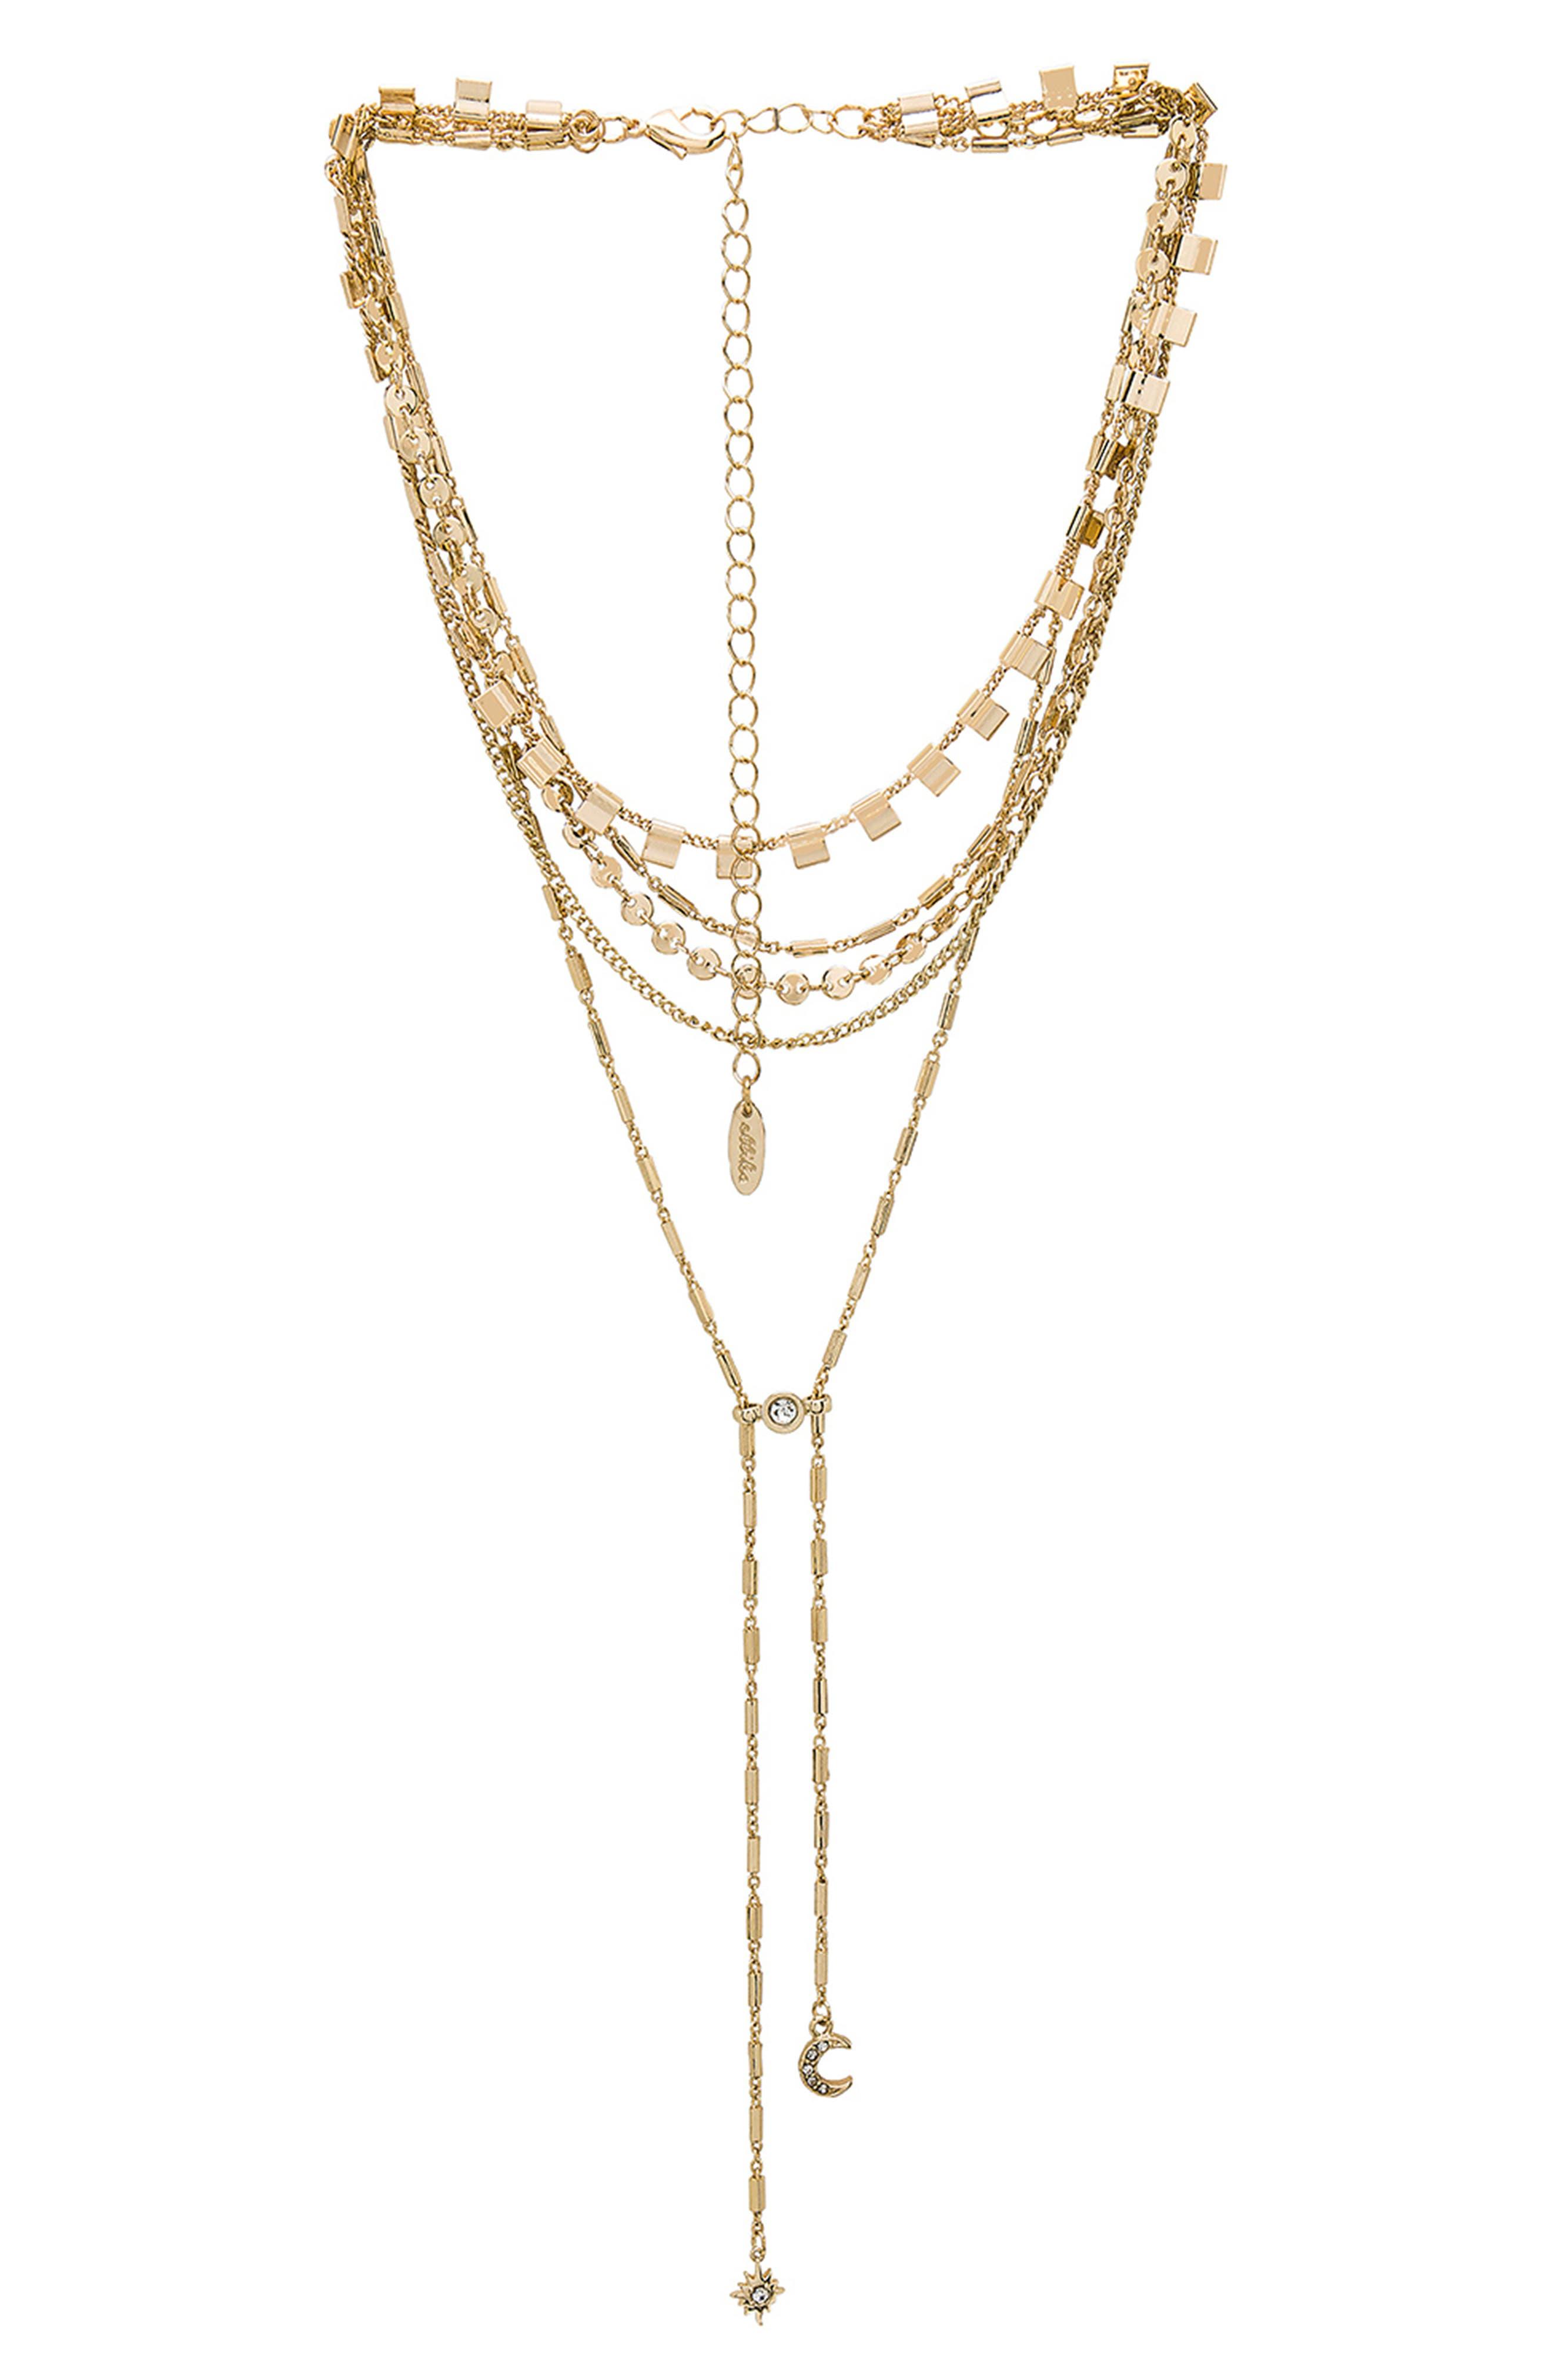 ETTIKA Layered Lariat Necklace in Gold